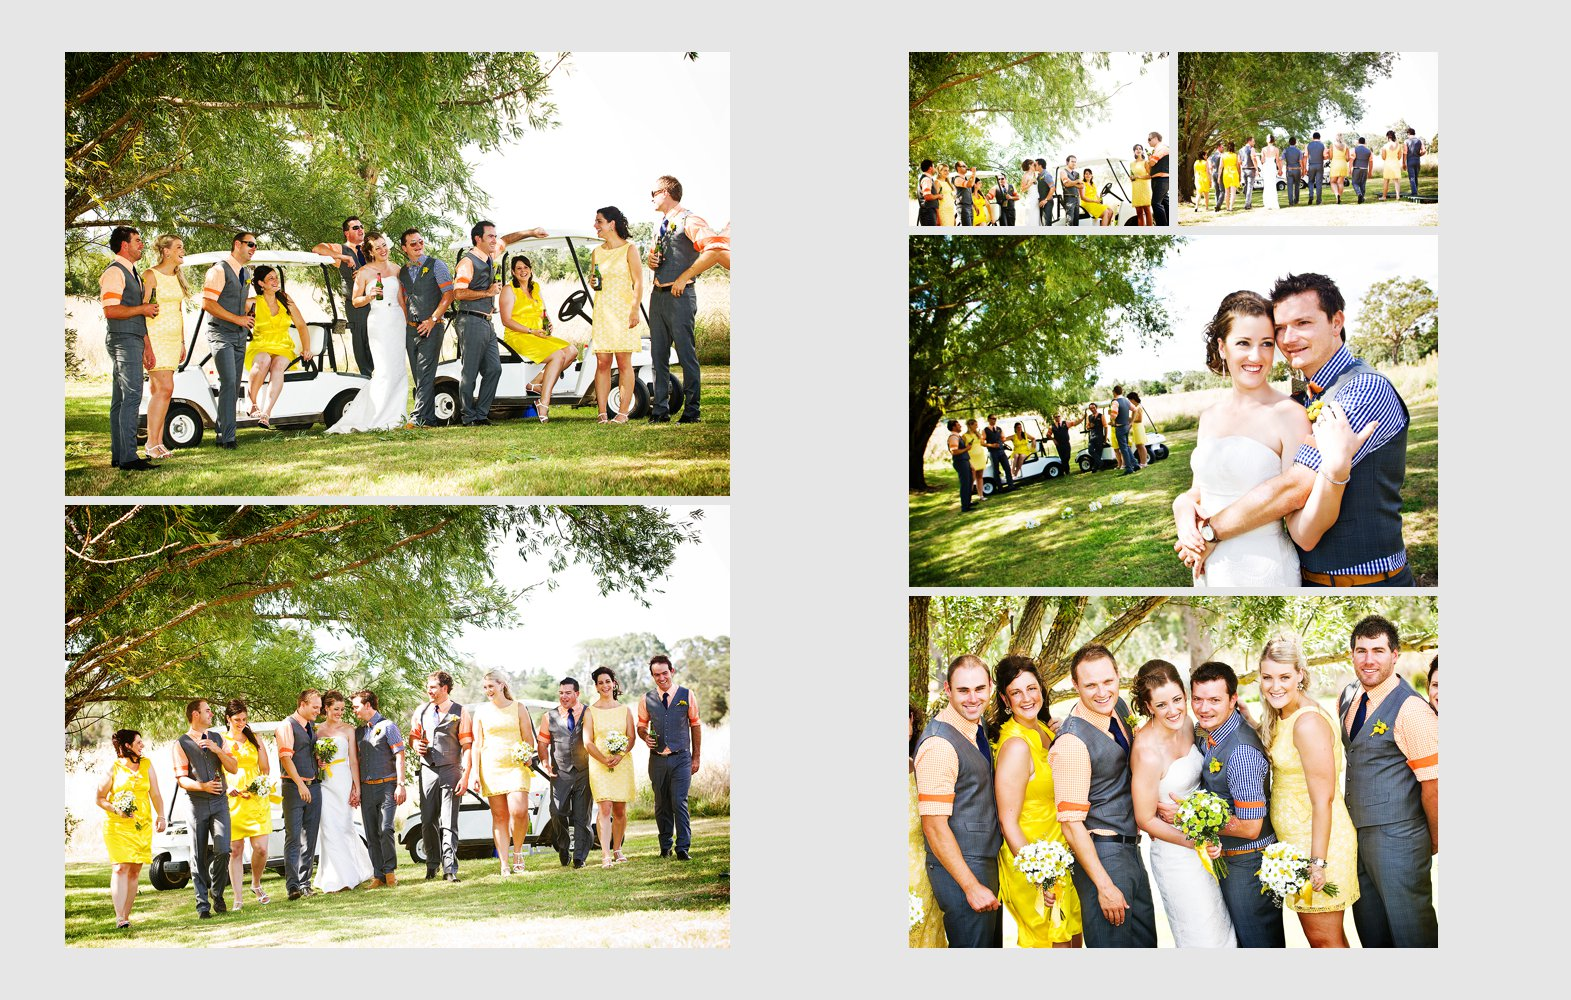 professional wedding photo albums Perth